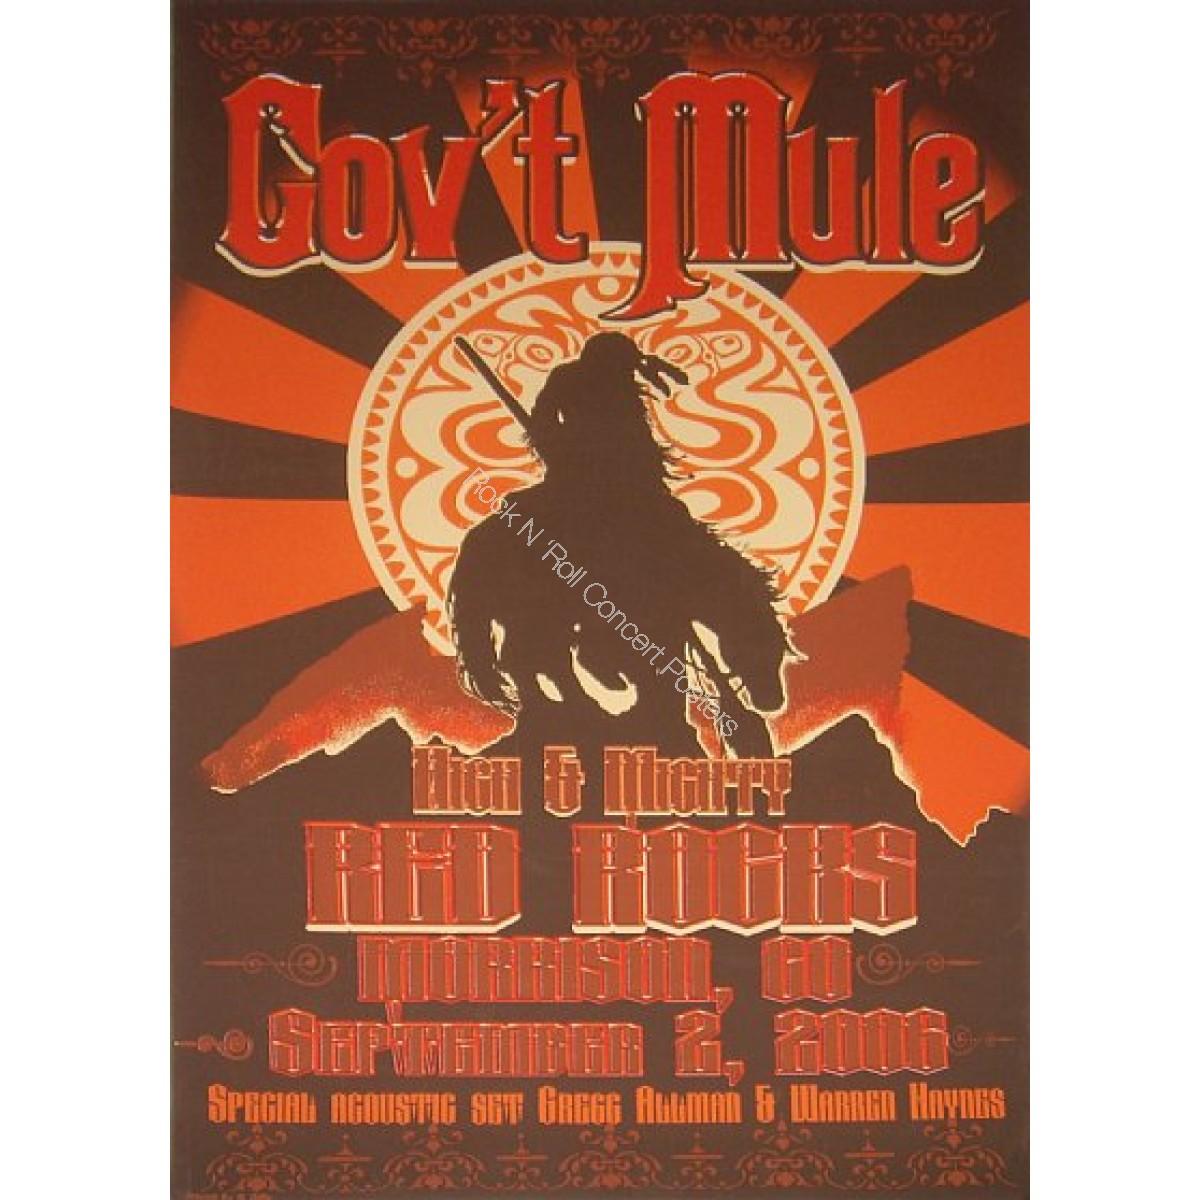 Gov't Mule @ Red Rocks Amplitheatre 2006